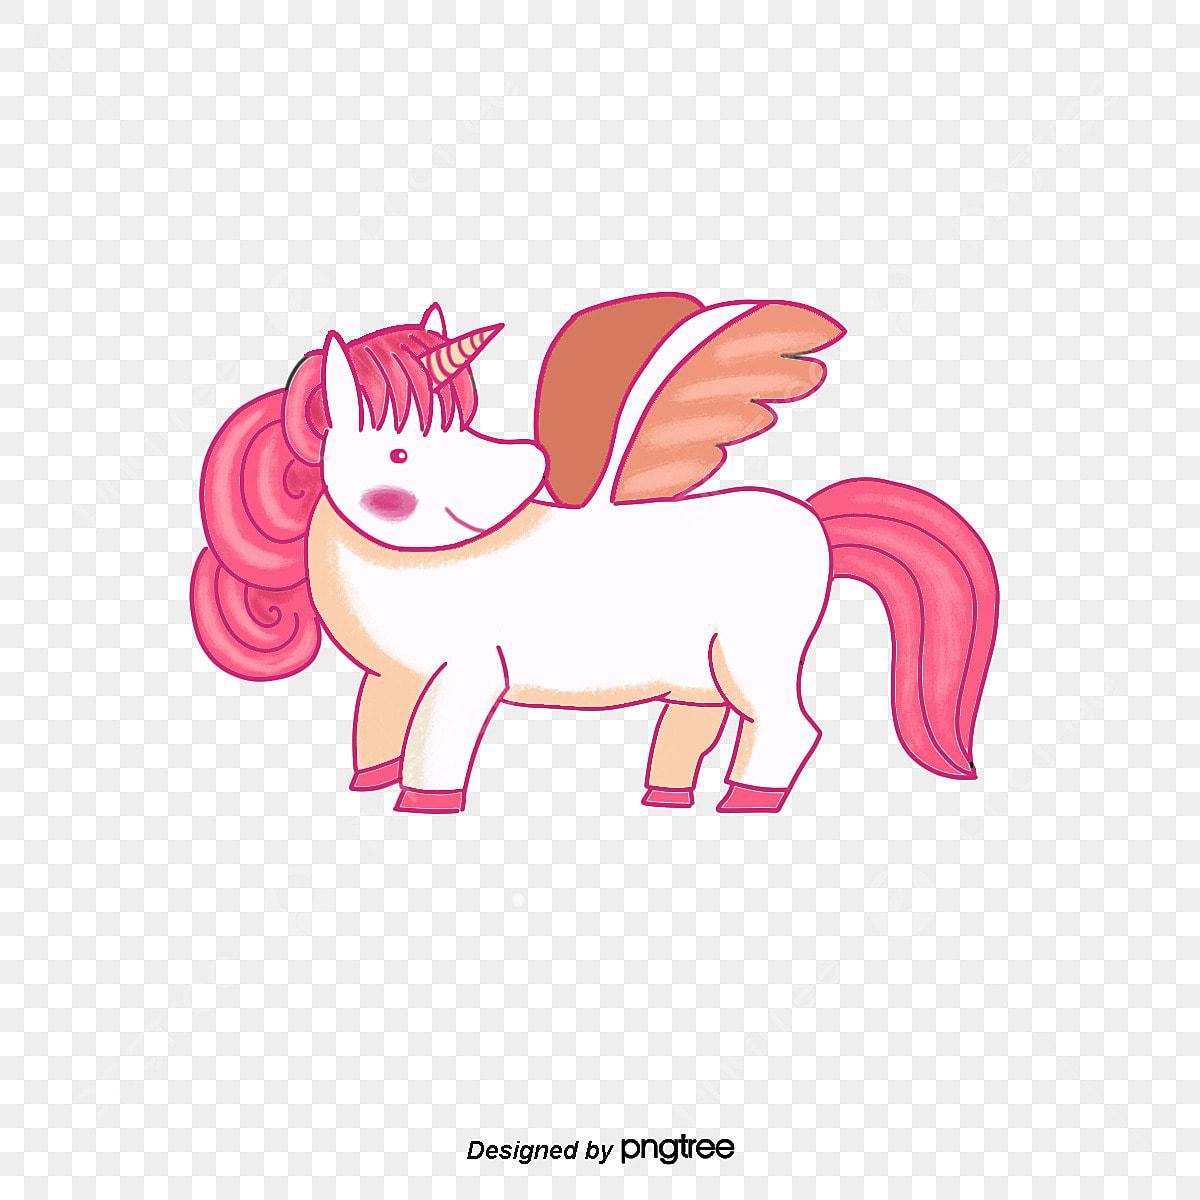 Pink Strok Rata Unicorn Ilustrasi Gambar Kartun Elemen